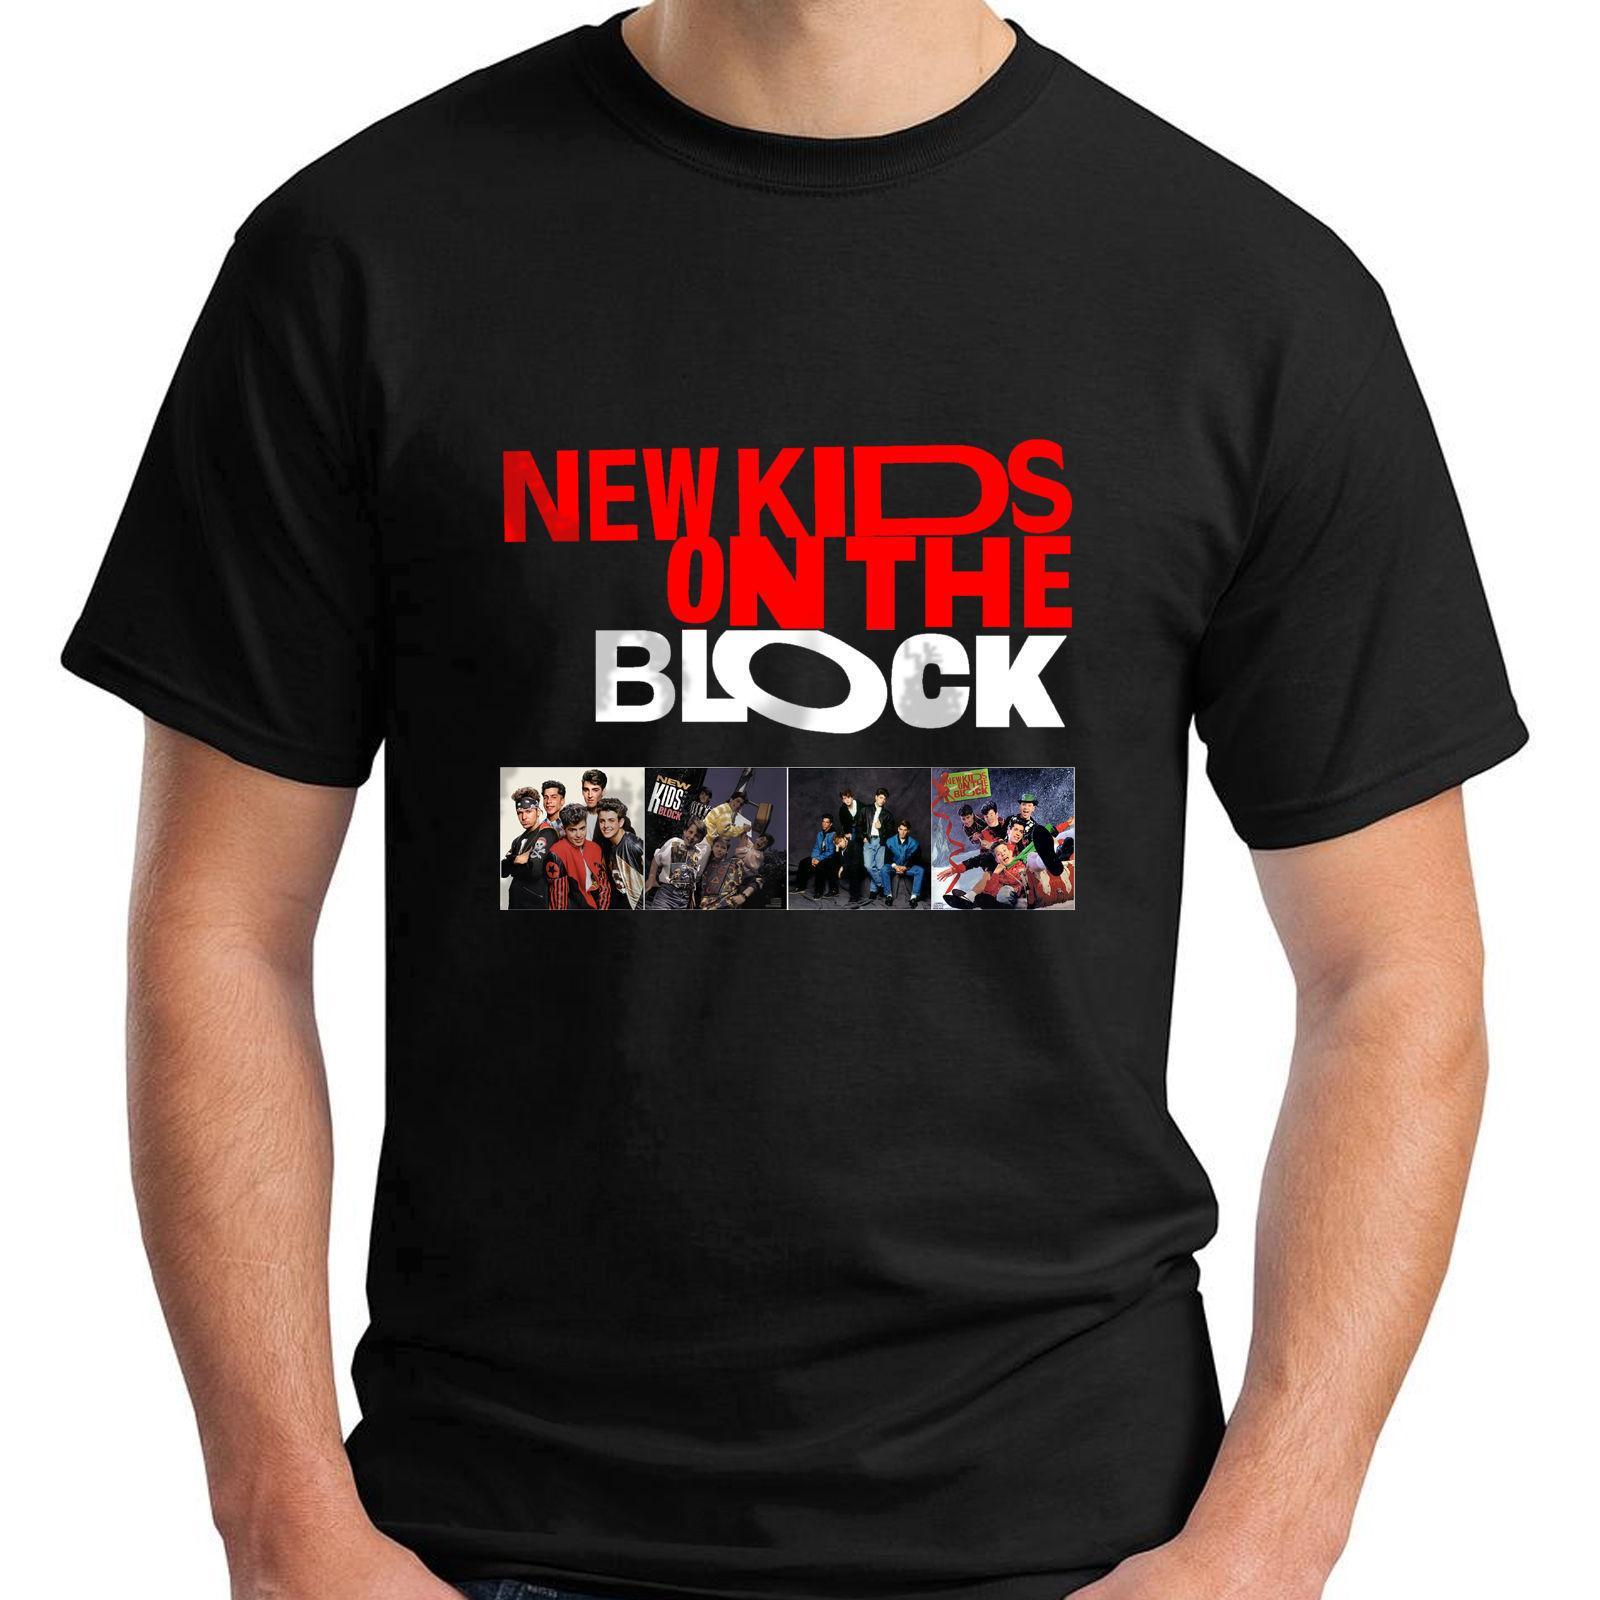 70bdf050 NEW NKOTB New Kids On The Block Music Legend T SHIRT S 5XL MAN WOMAN Funny T  Shirts For Women Funny Shirt From Australiae, $11.01| DHgate.Com